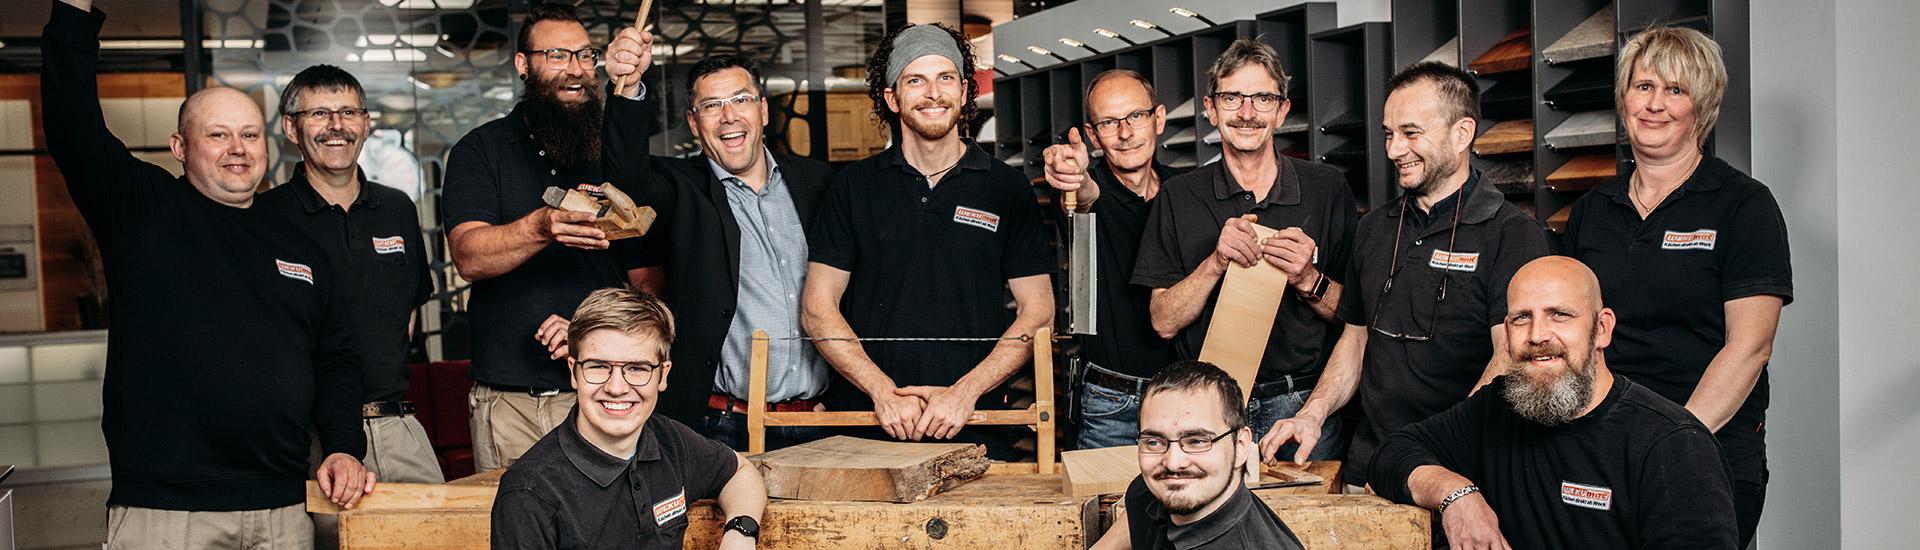 Das Team des Küchenstudios WEKUmat bei Offenbach